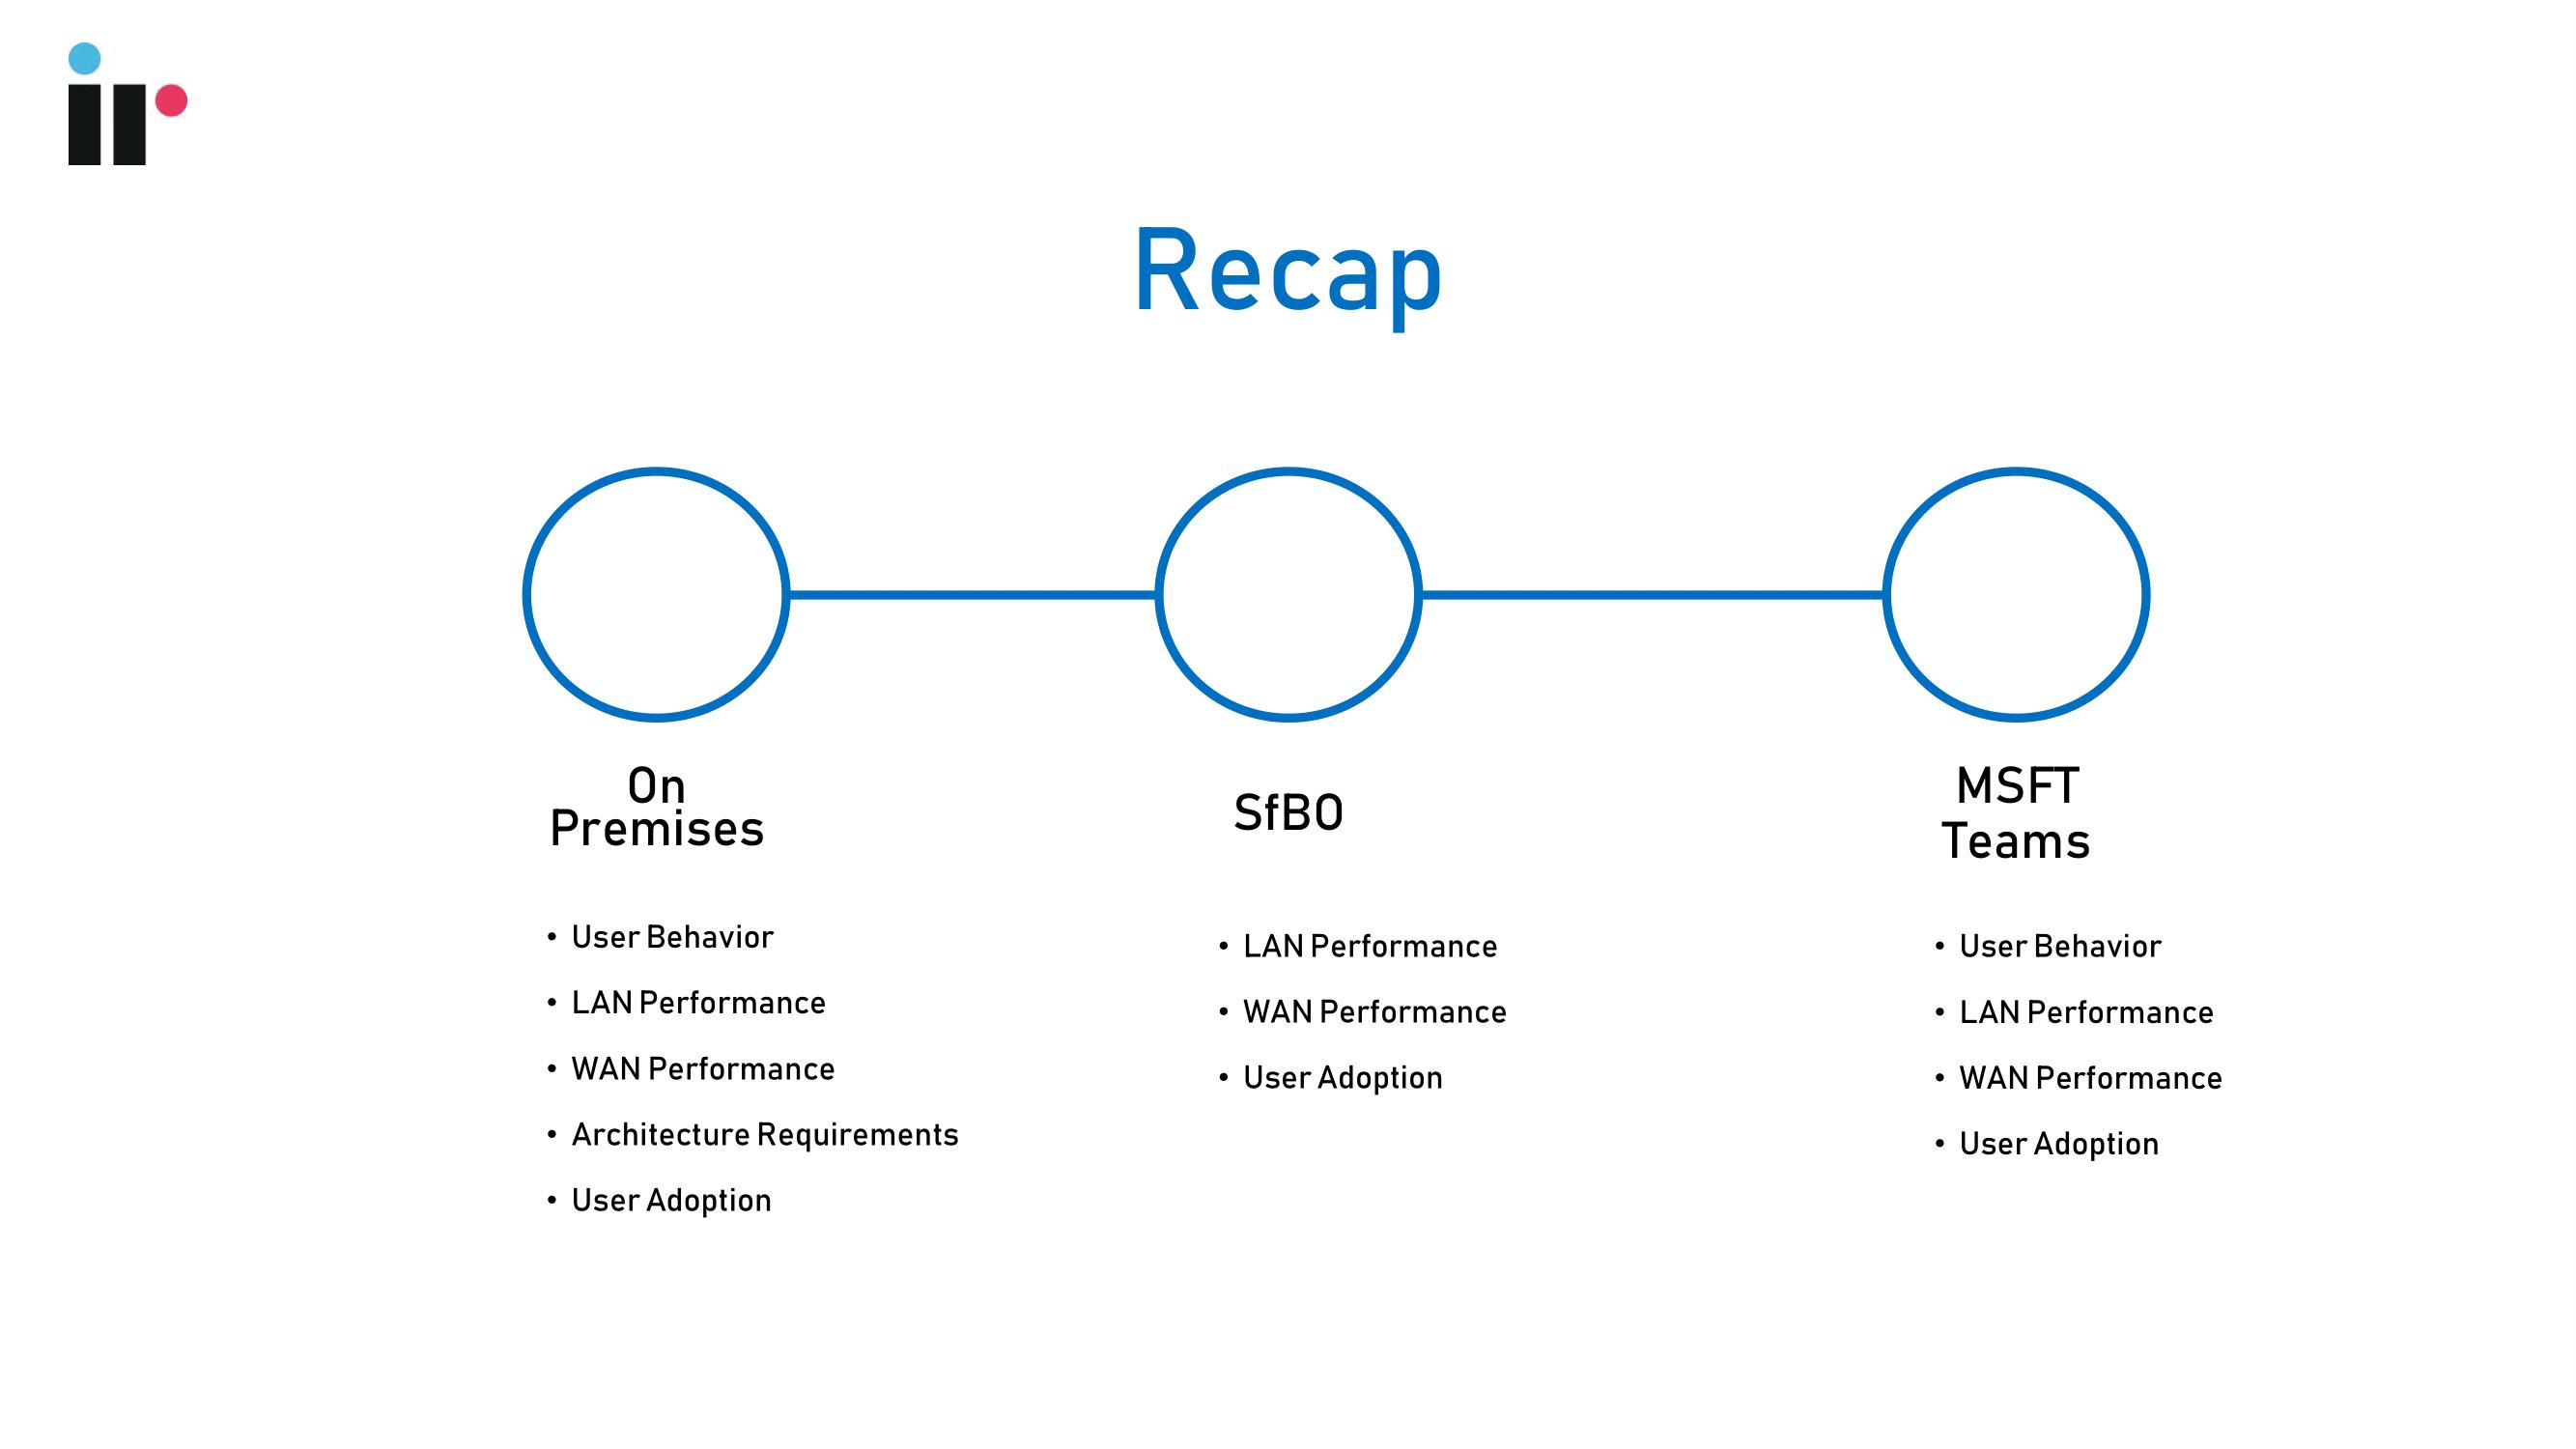 Recap of Microsoft Teams deployment phases